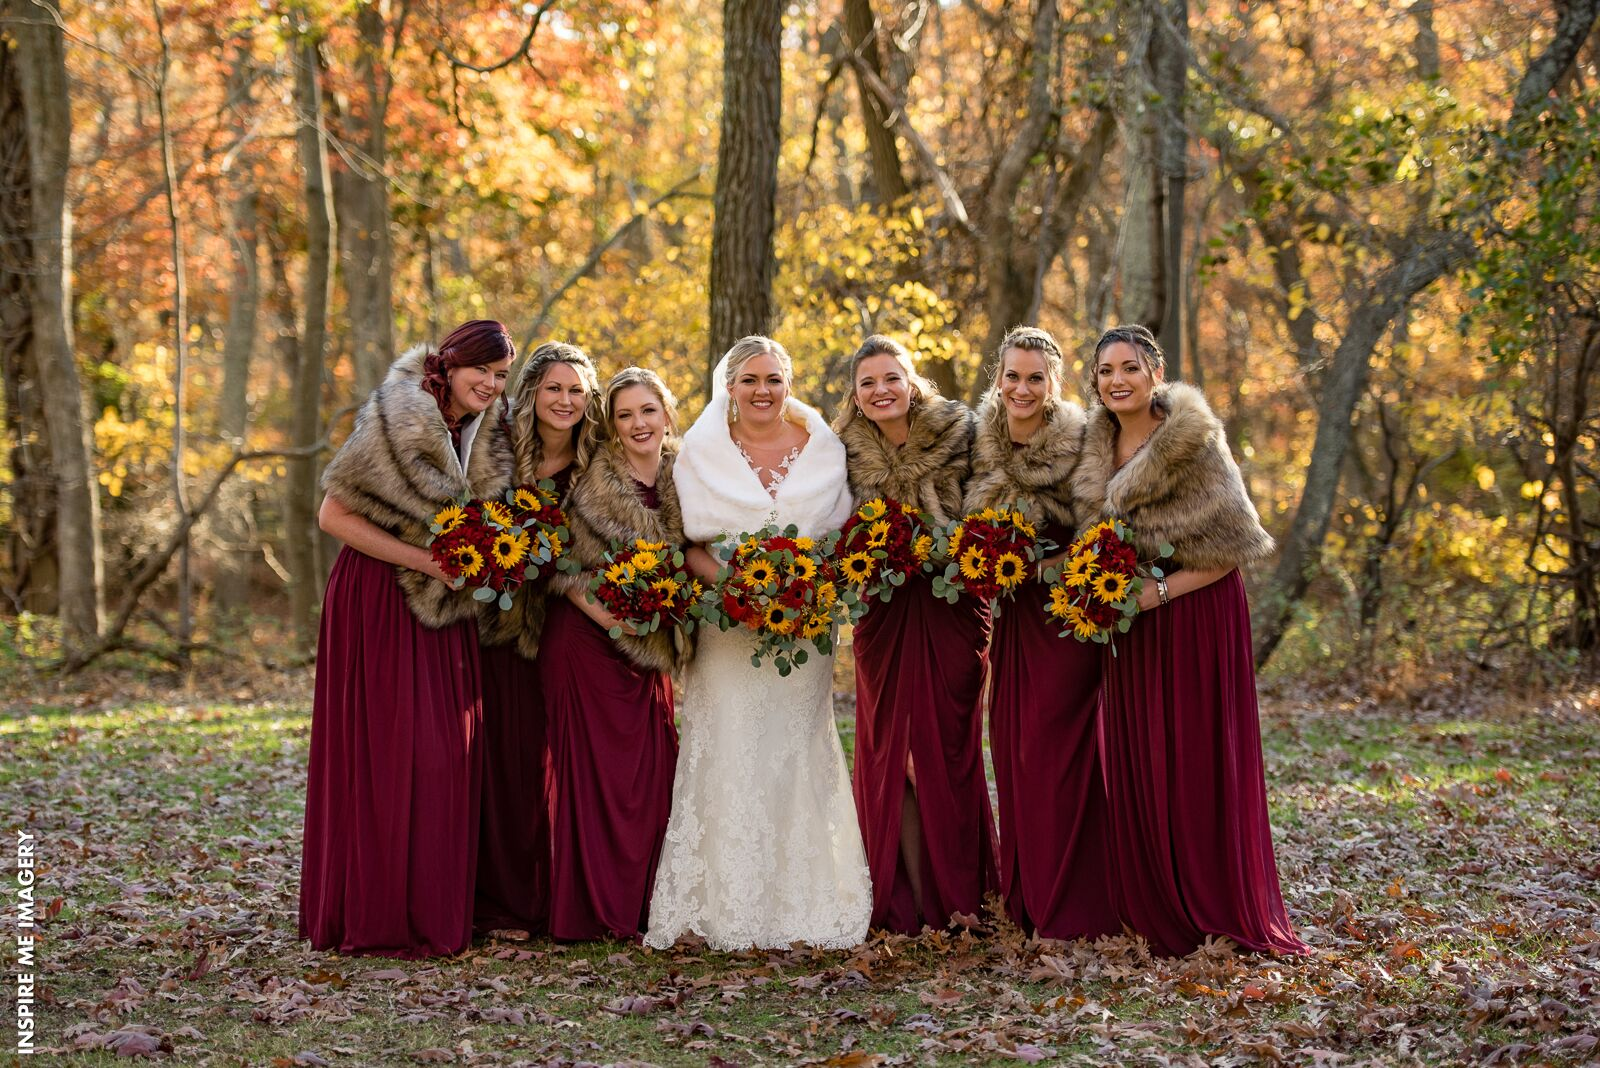 Bold Fall Wedding Colors bride and bridesmaids